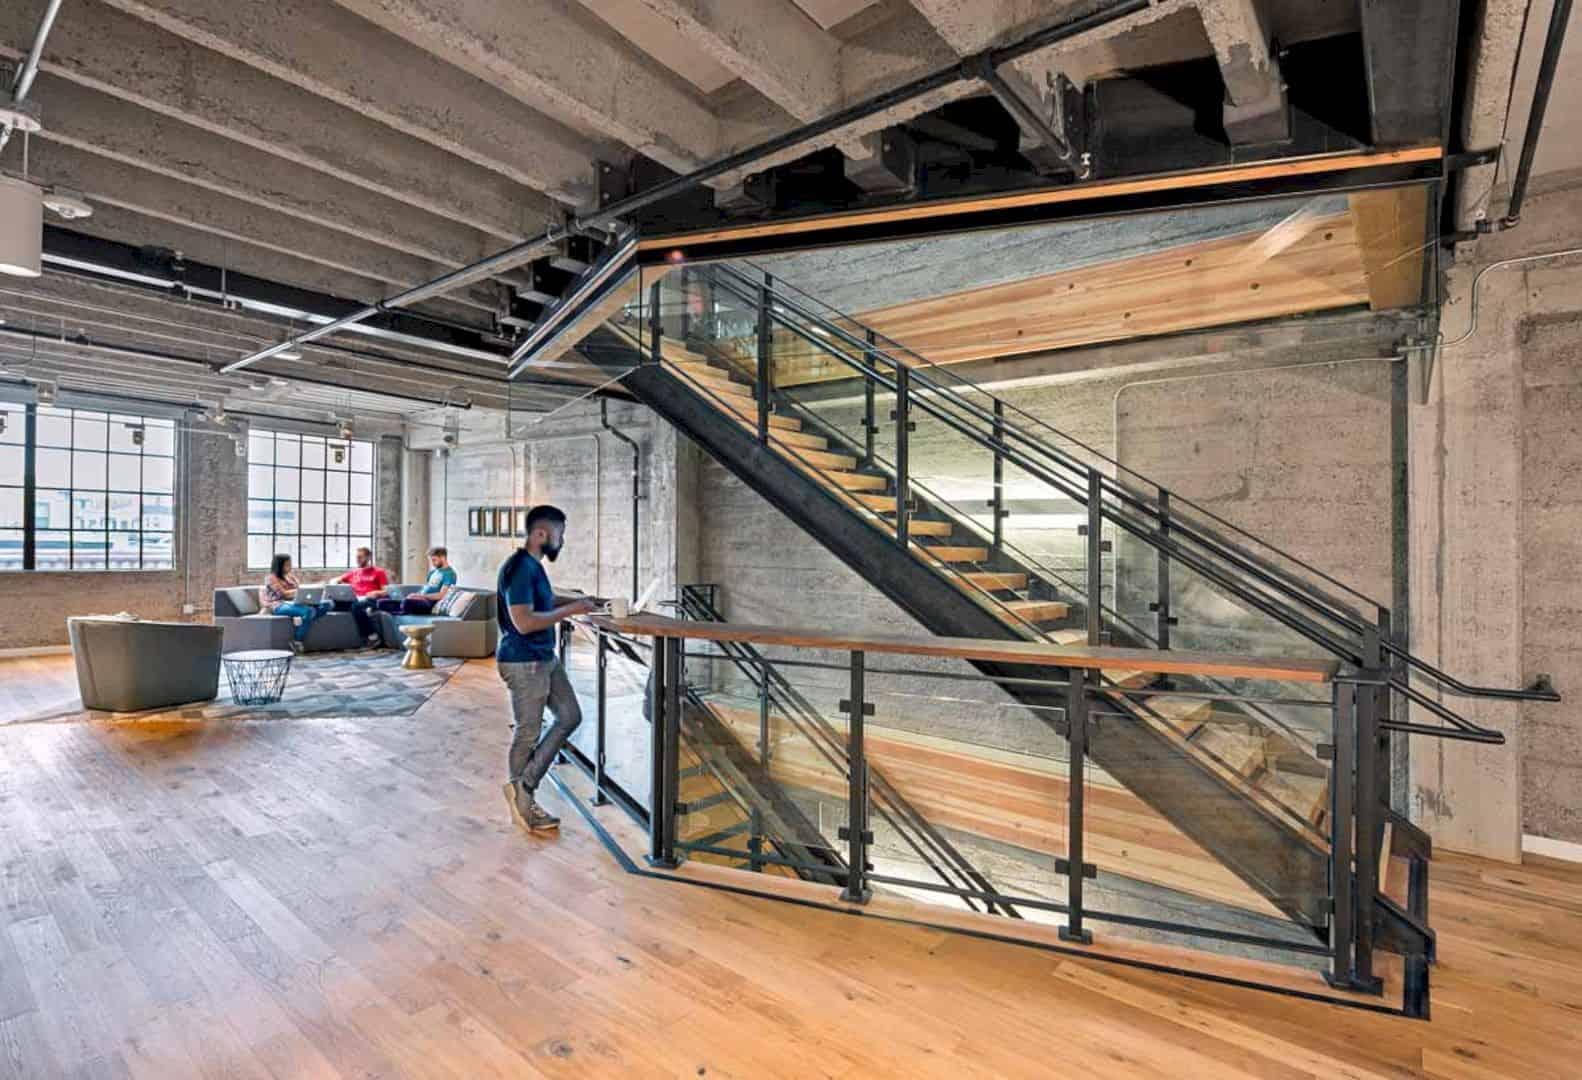 Clever Headquarters: Modern Interior of SOMA Warehouse in Dark Basement Level